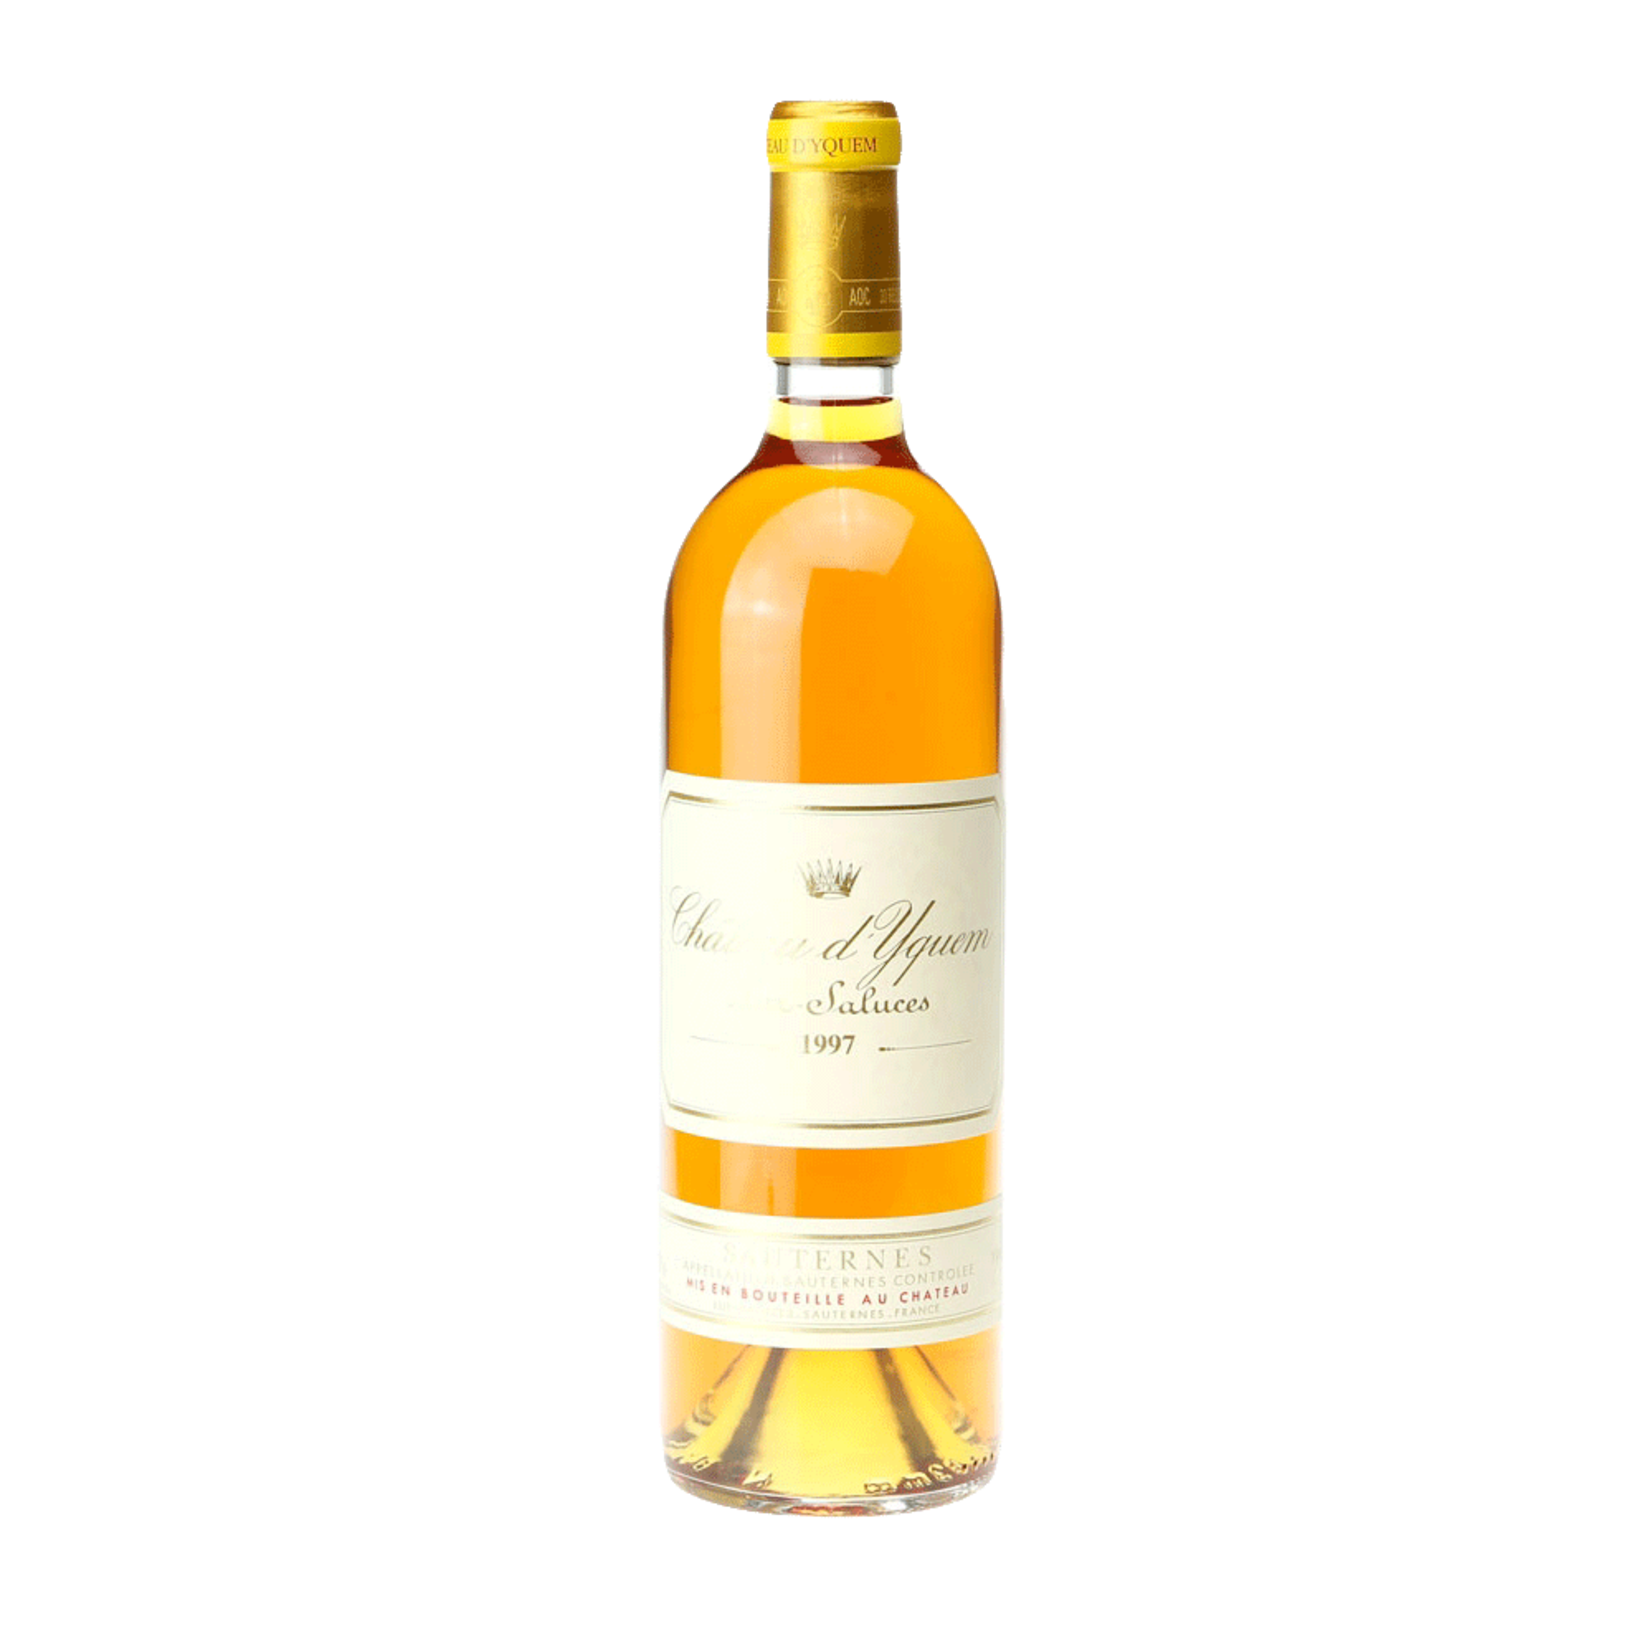 Wine Chateau d'Yquem 1997